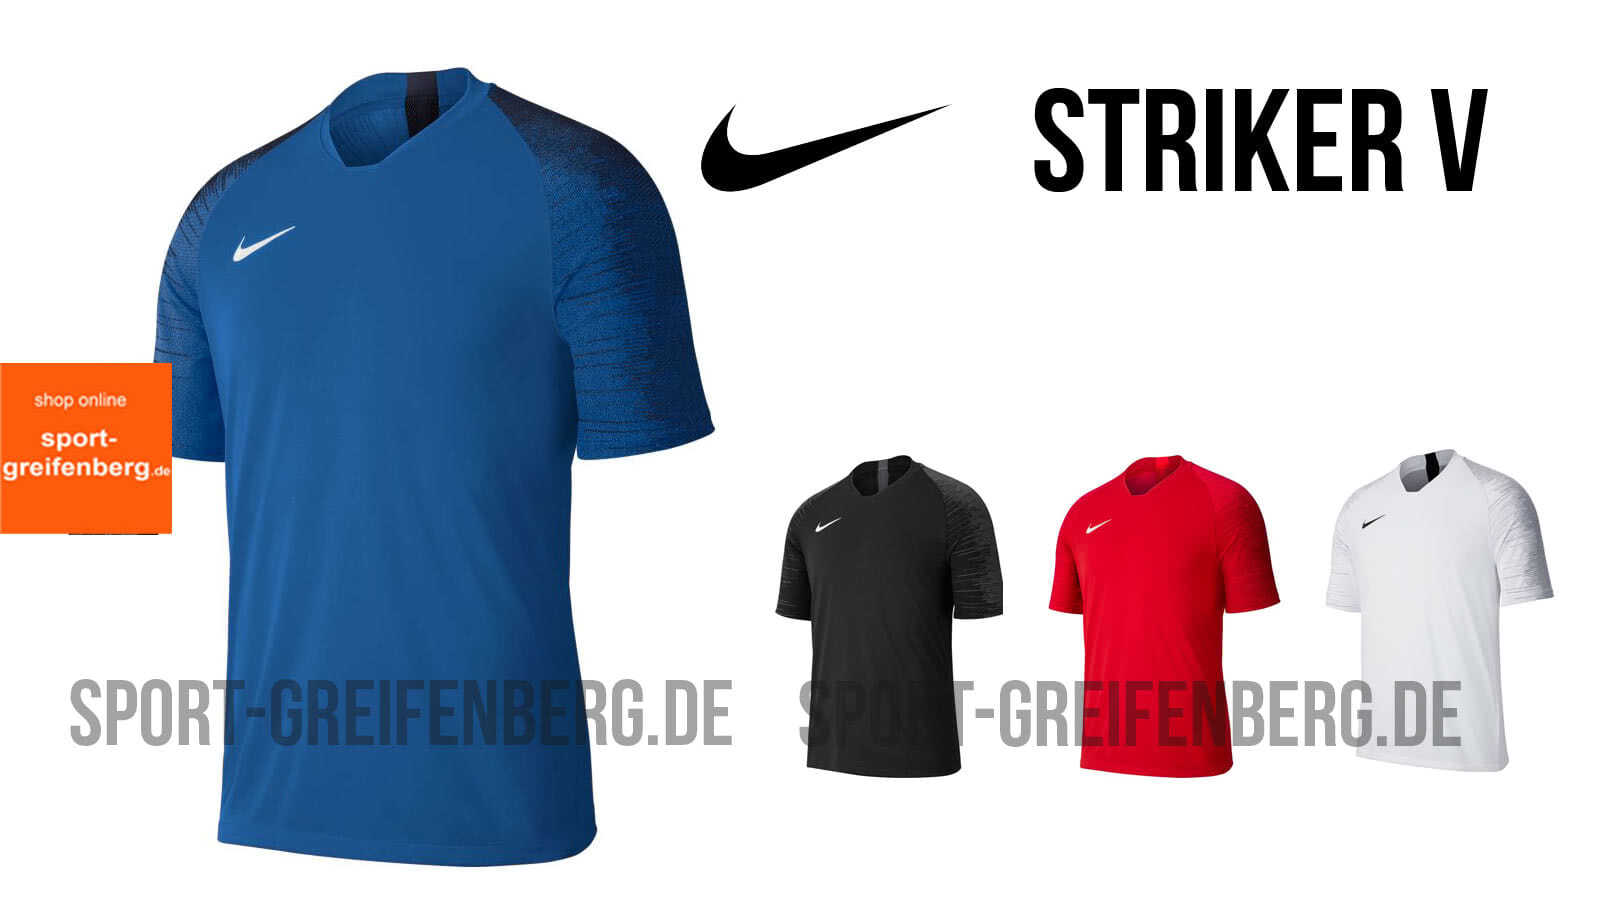 Nike Trikots 2019/2020 ✓ Die Neuheiten | alle Nike Jerseys